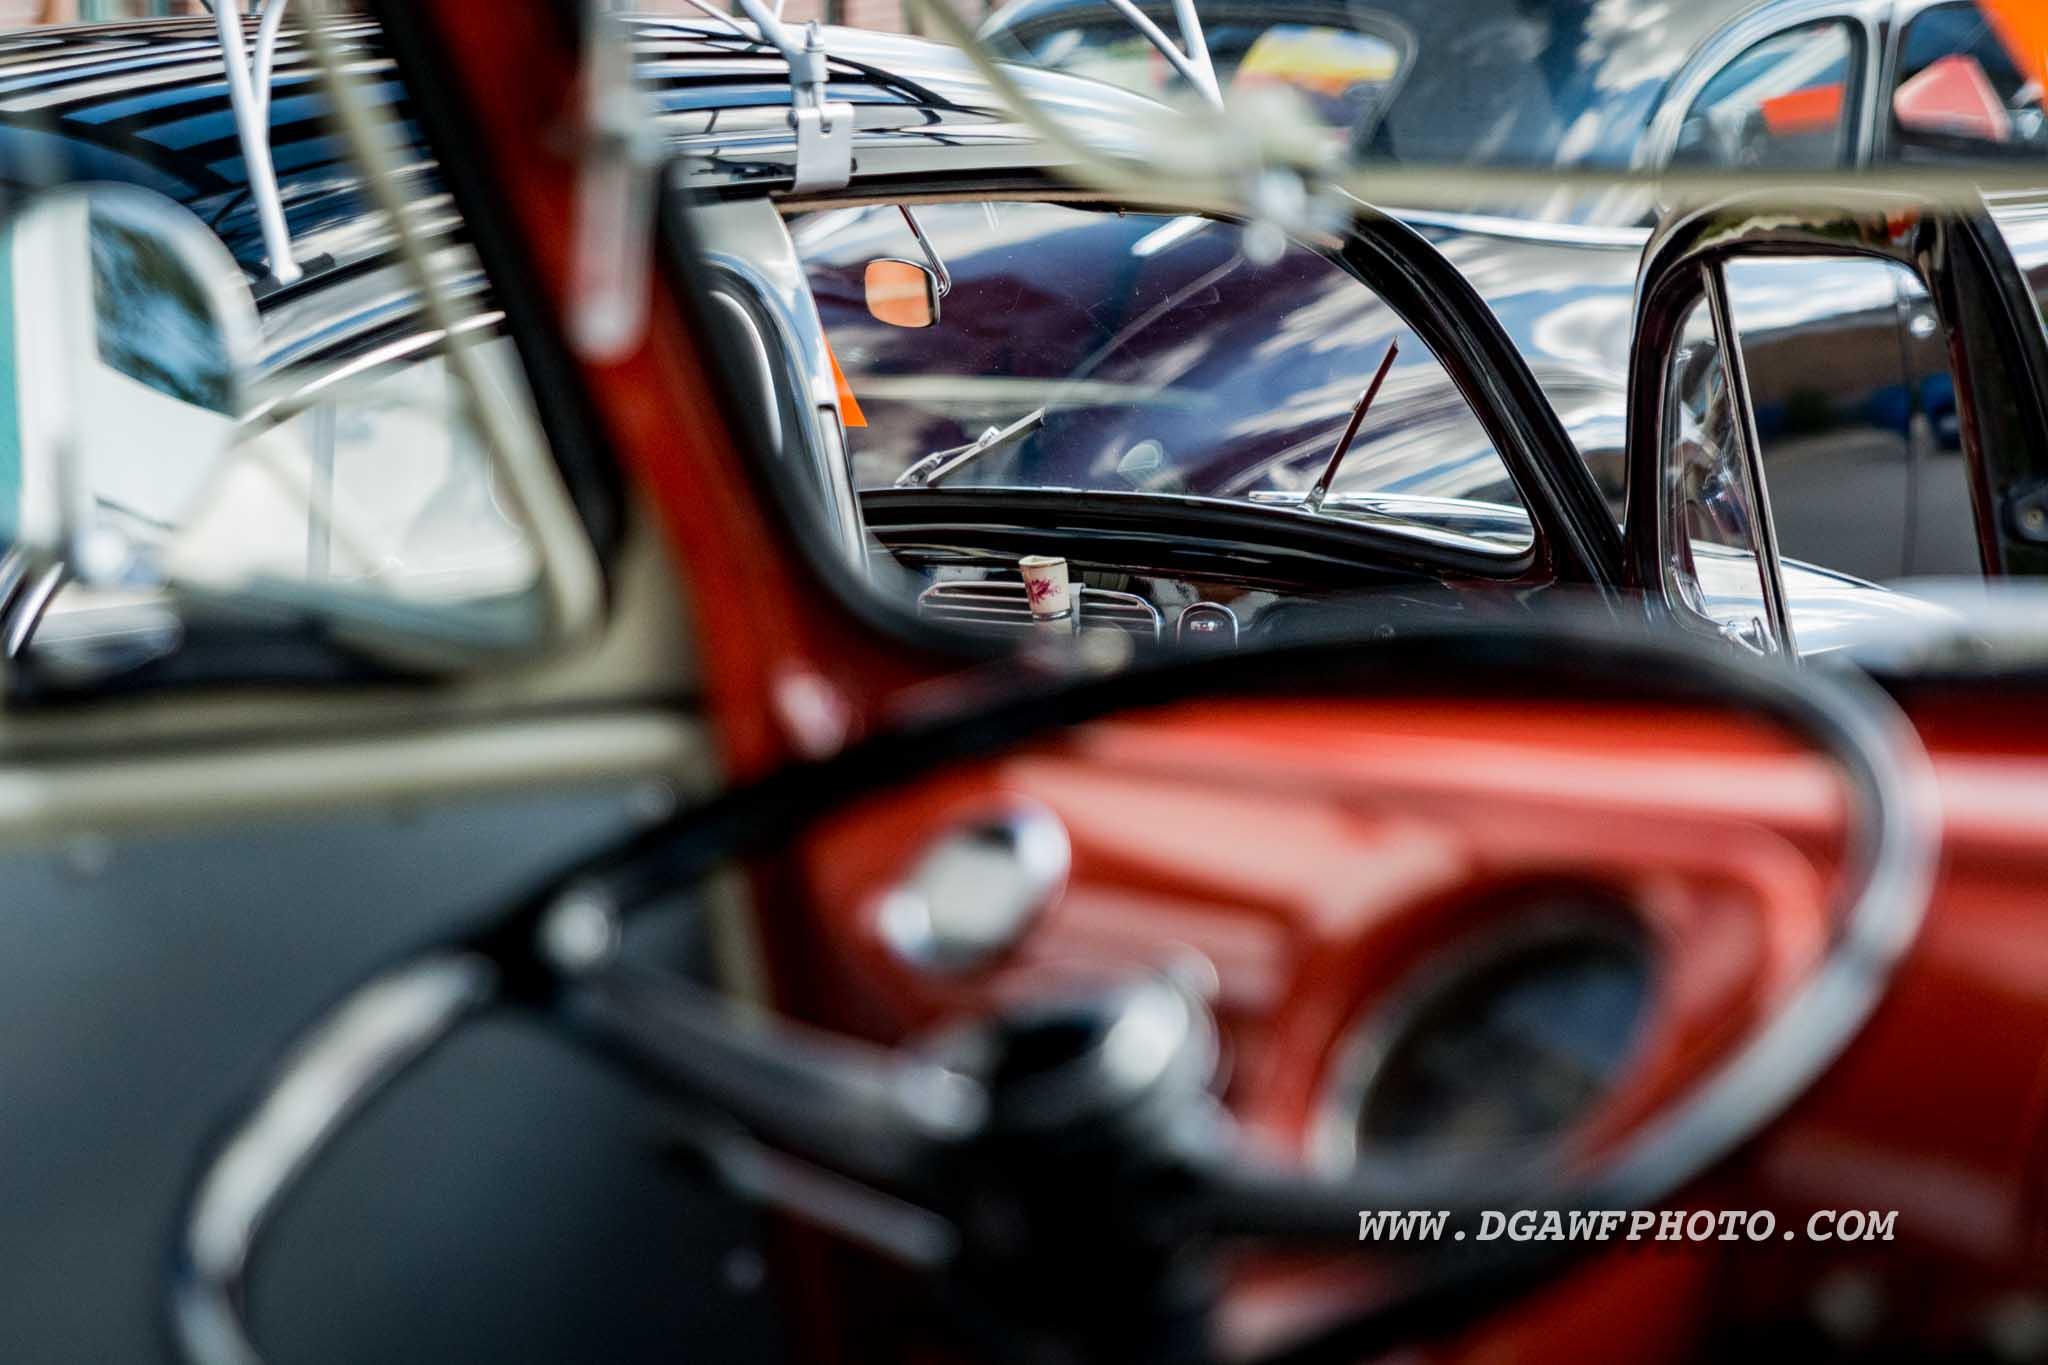 DGawfPhoto-117.jpg